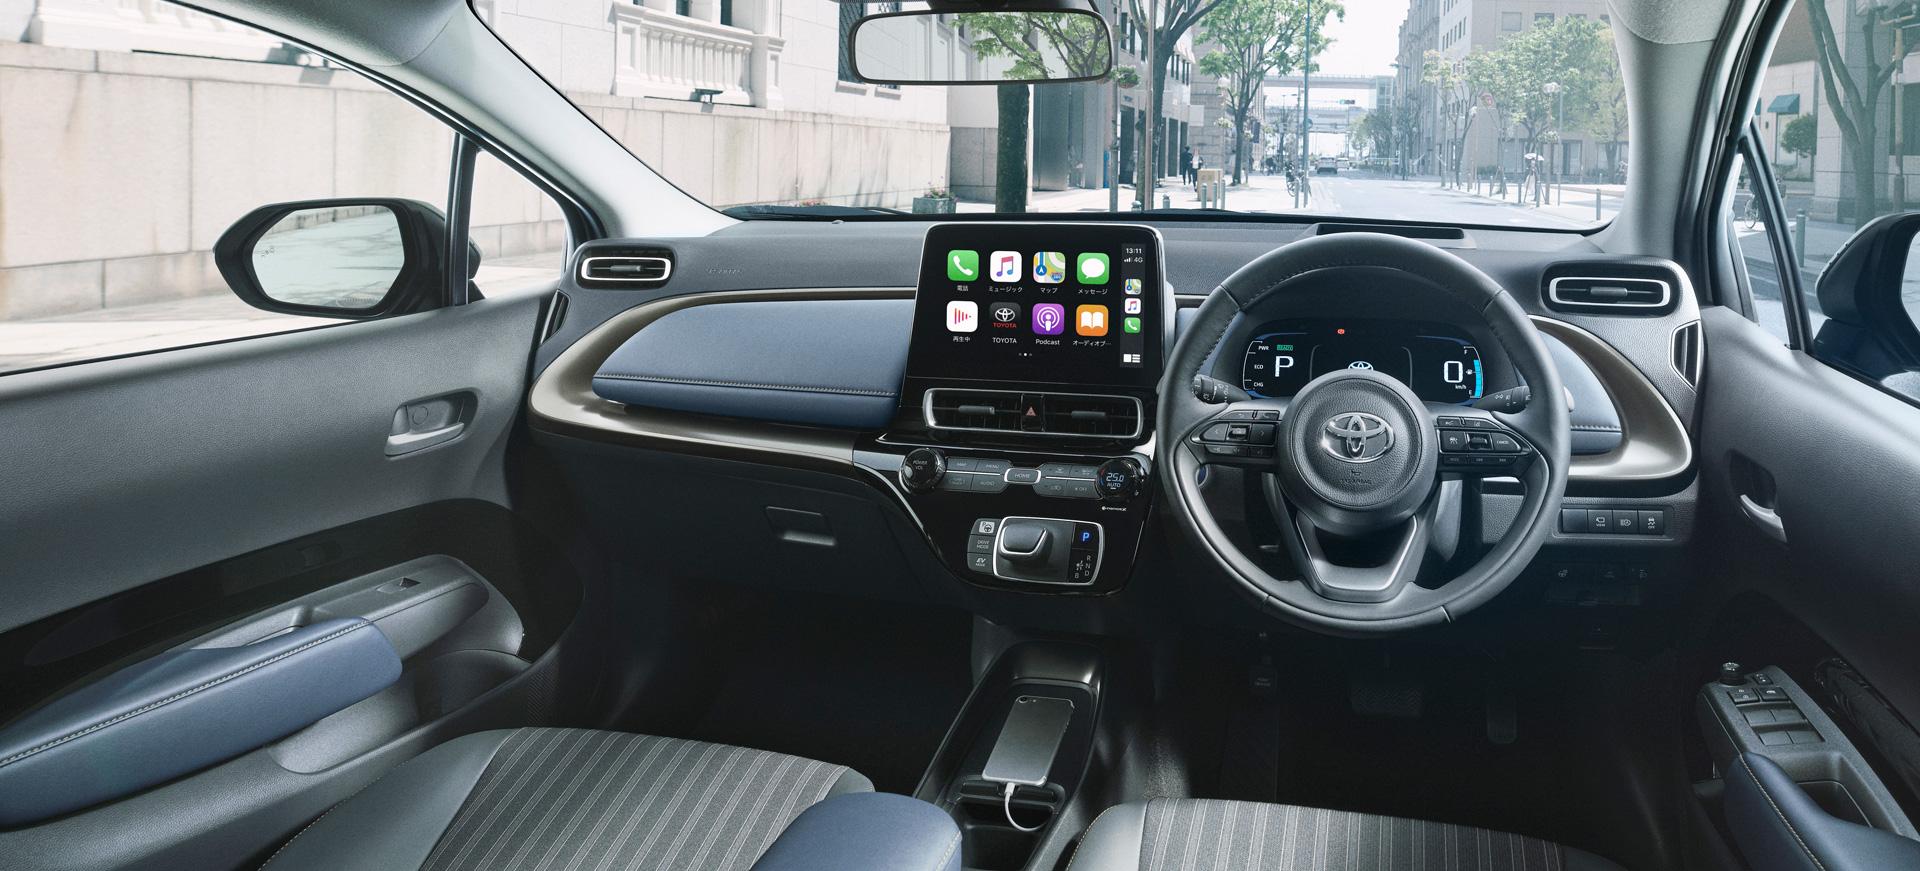 Toyota to Launch All-New Aqua - Image 4